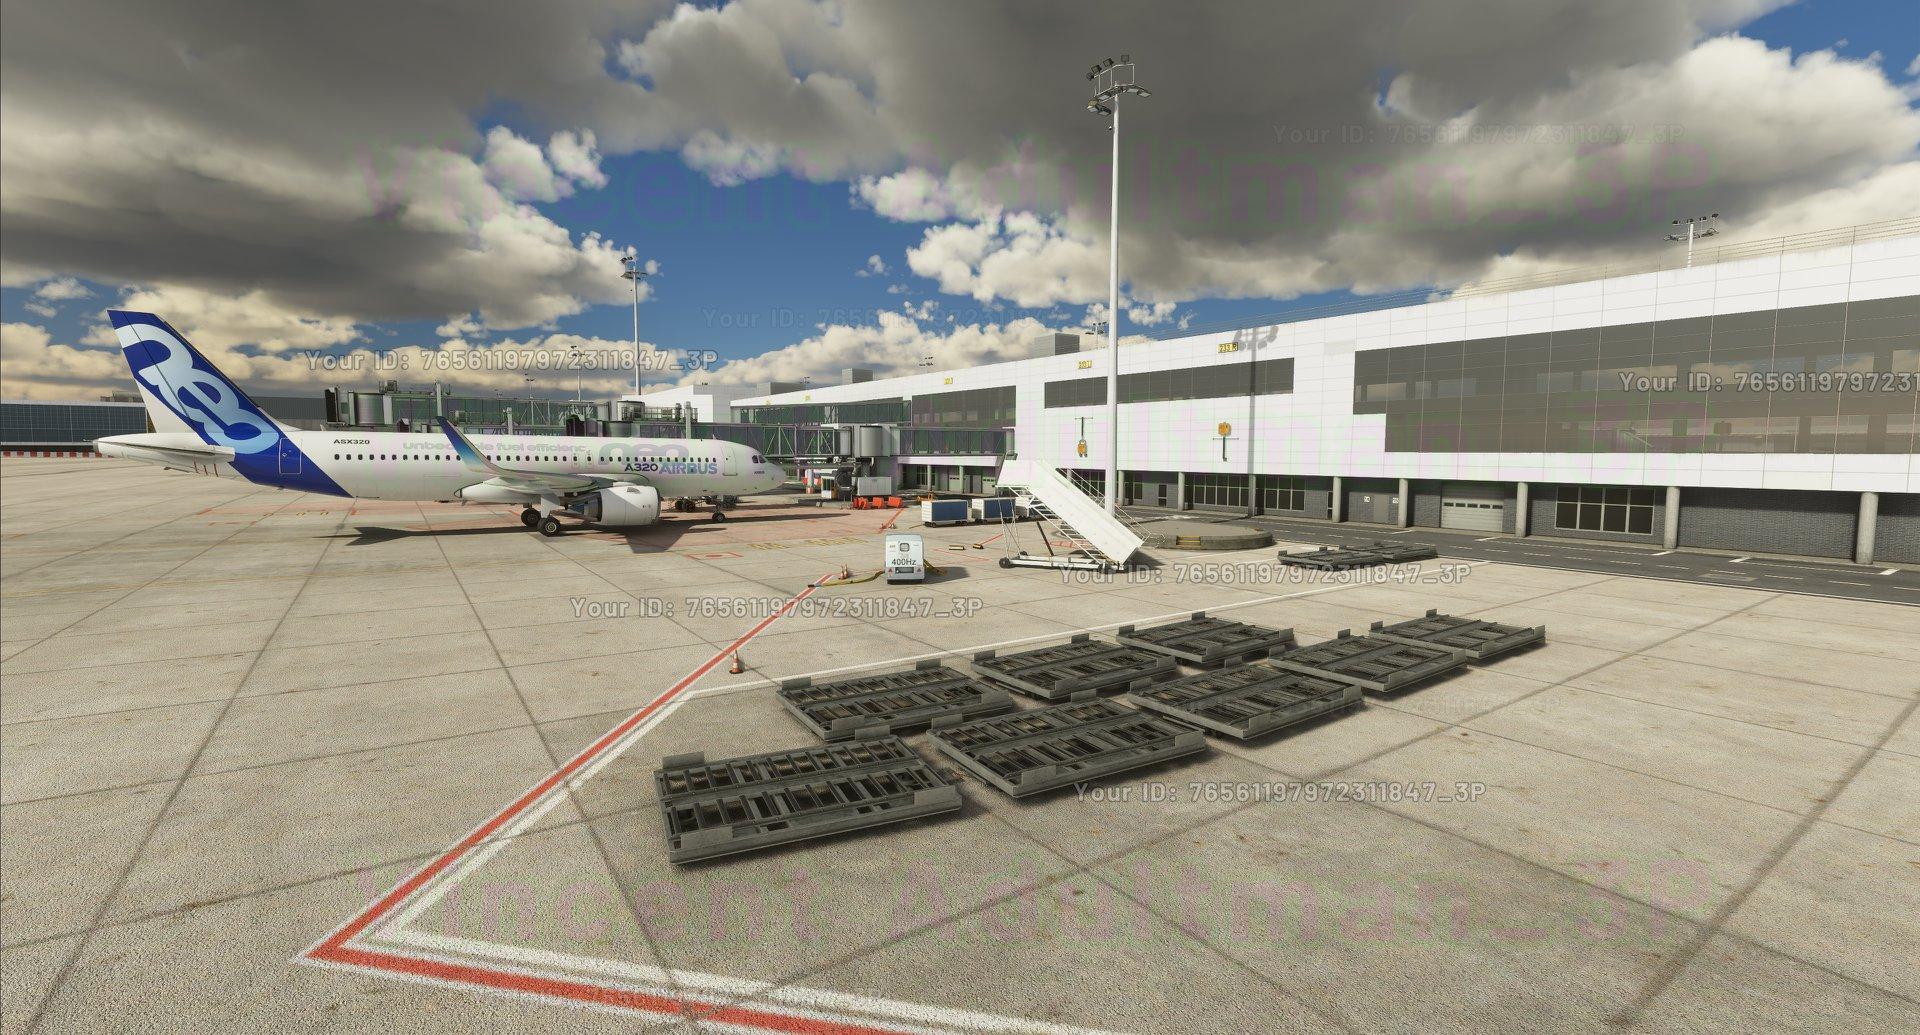 Aerosoft-Brussels-MSFS-Preview-02 Aerosoft - Brussels MSFS Preview